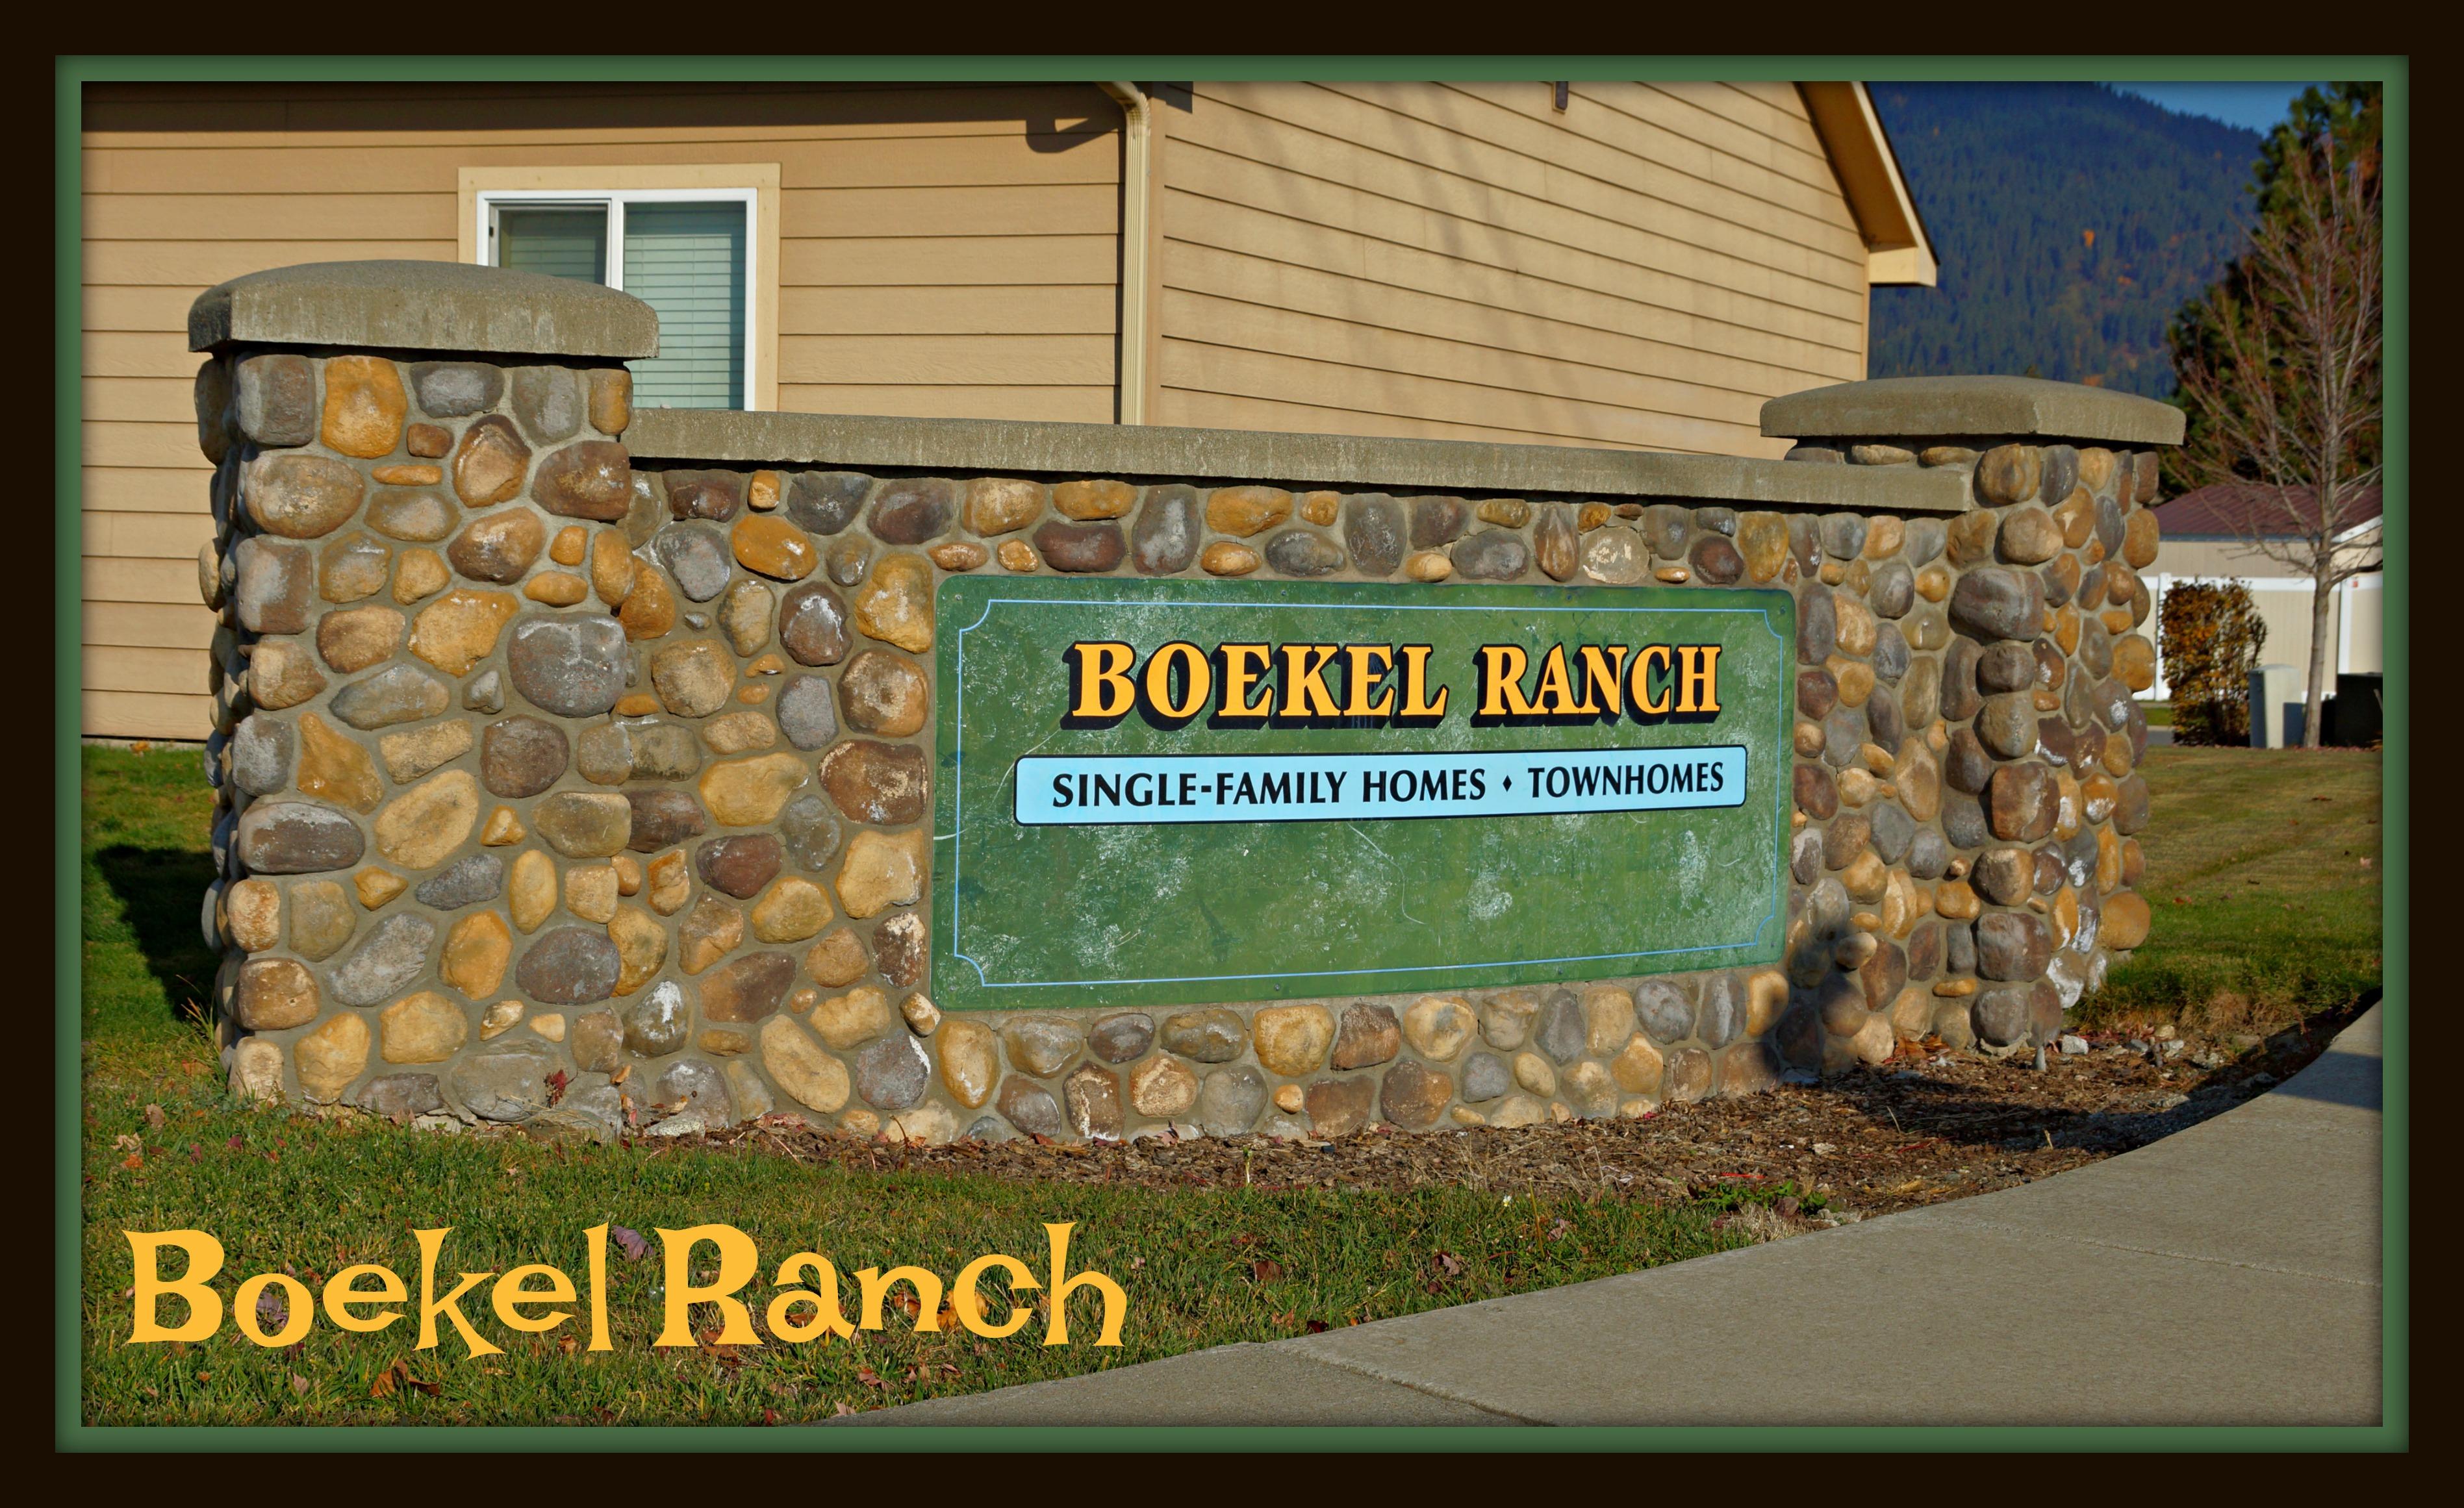 where is Boekel Ranch